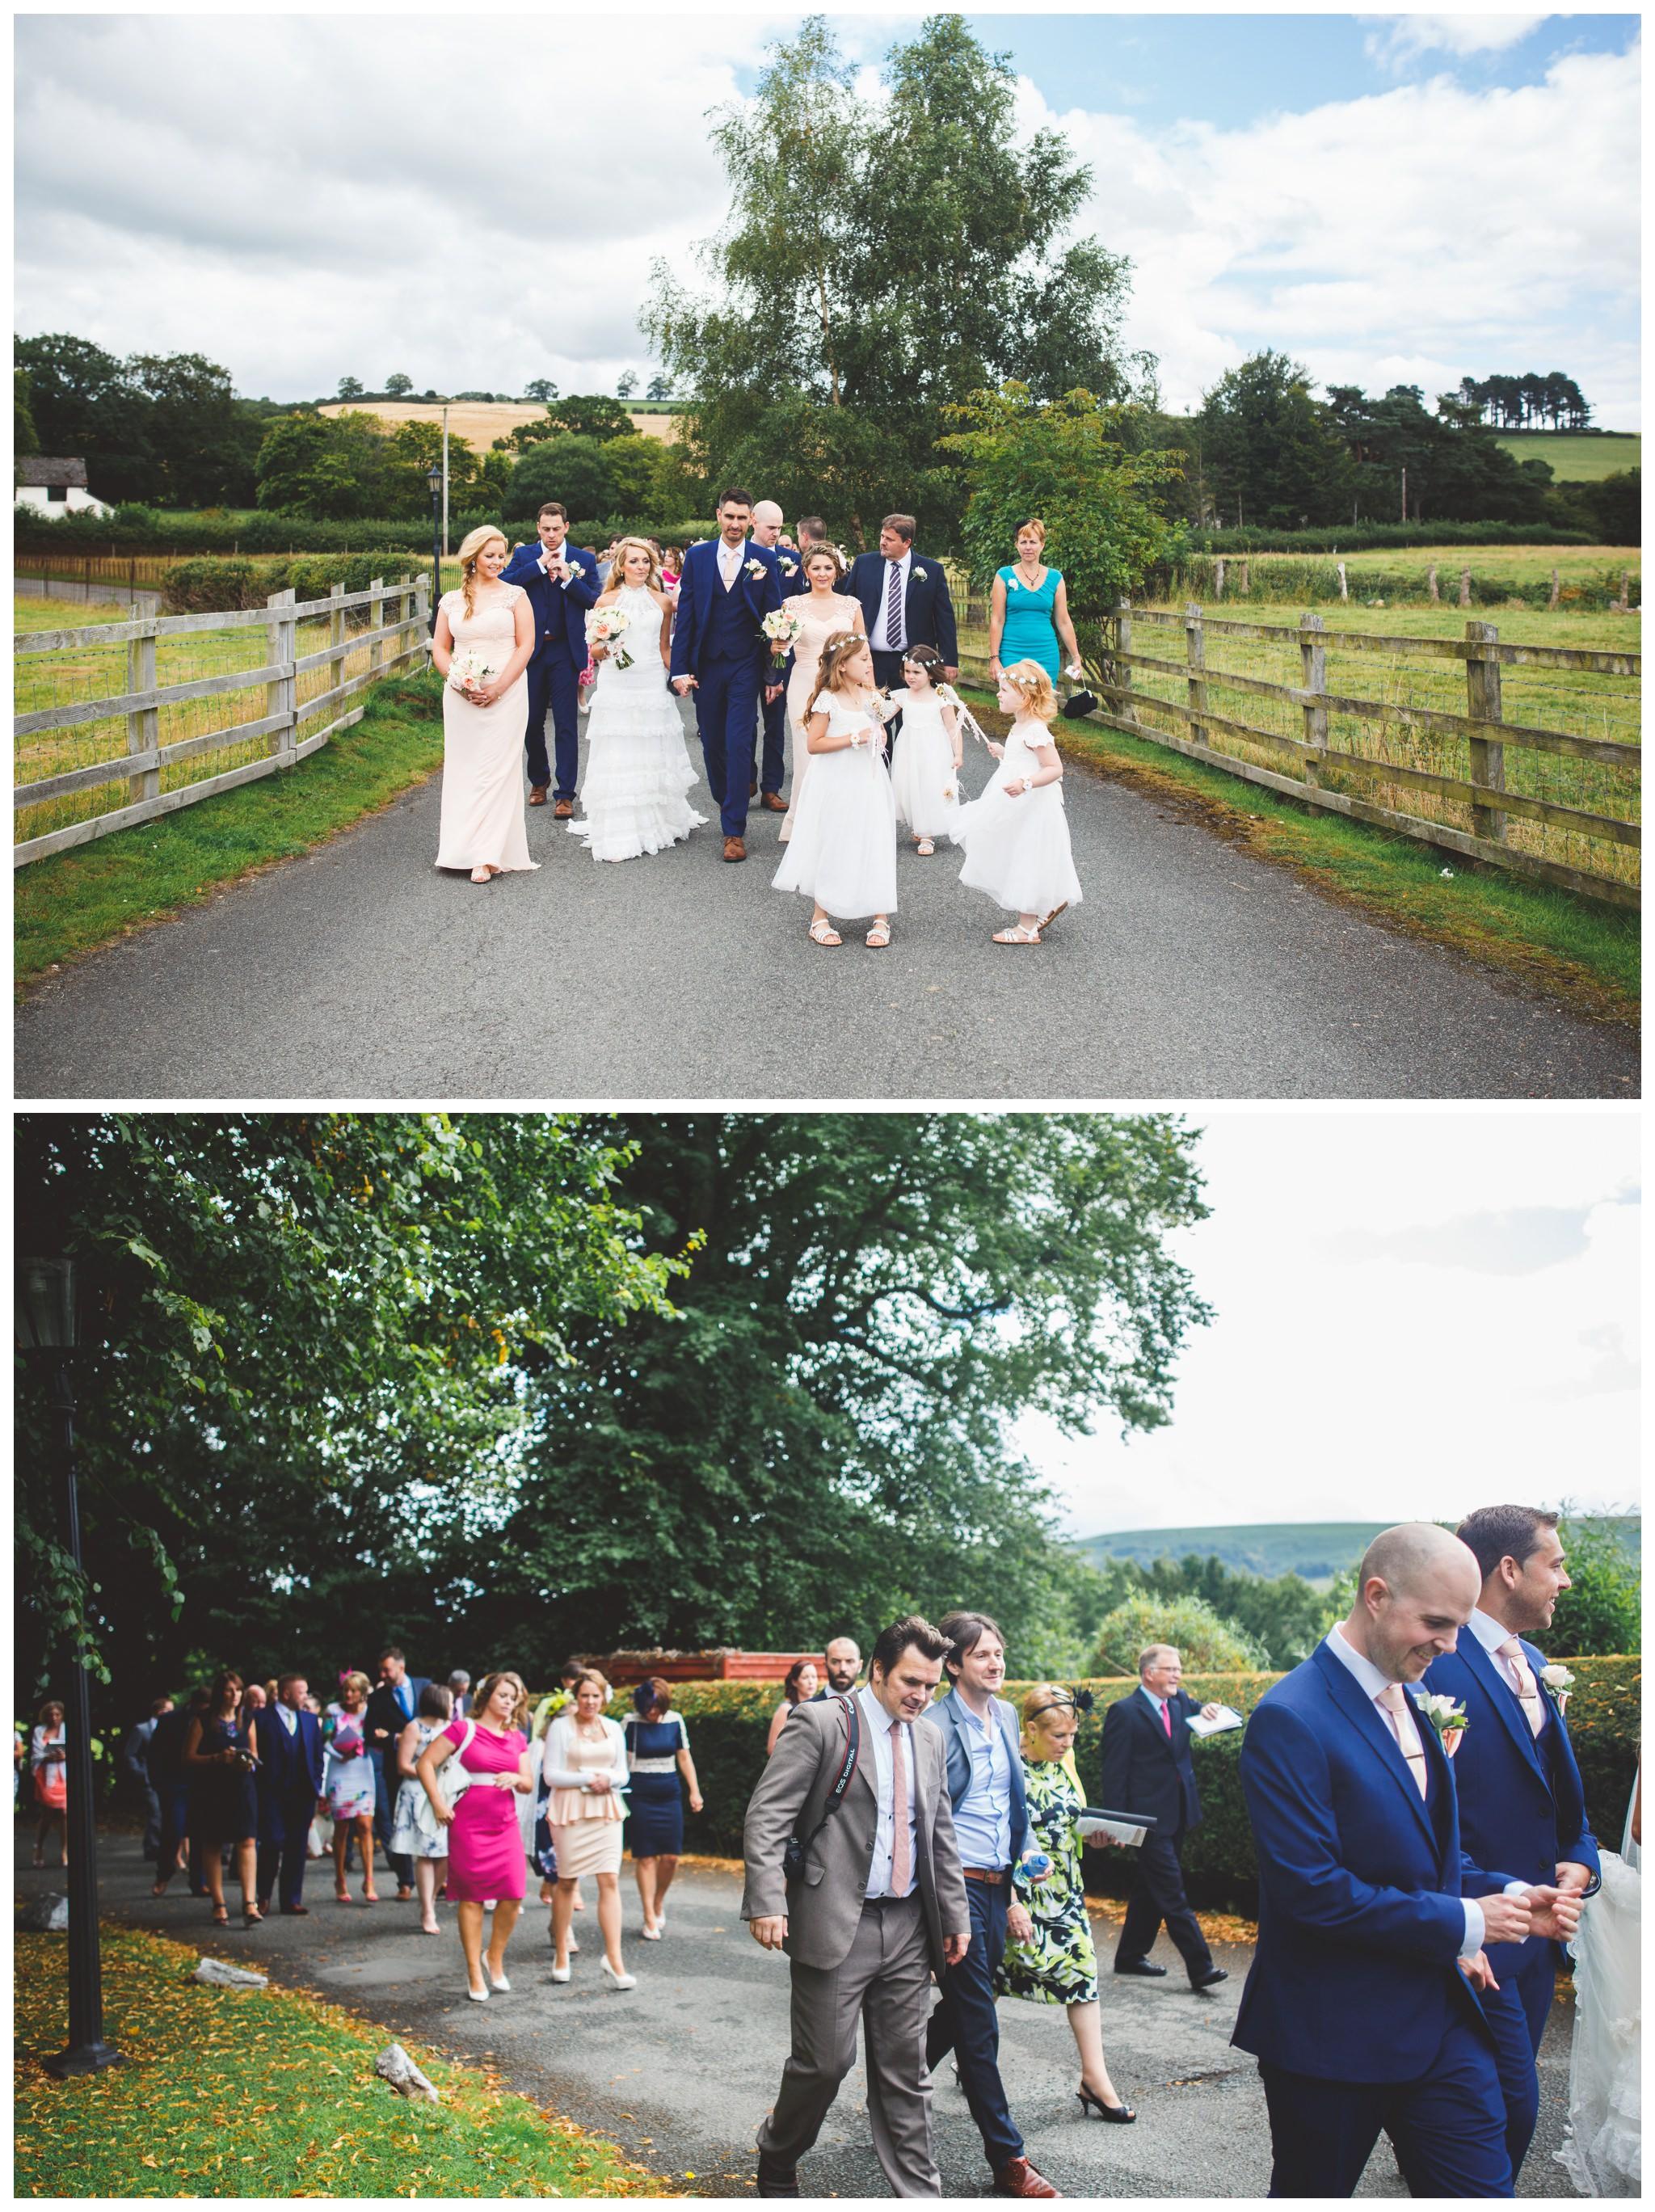 Richard Savage Photography - Wedding - Peterstone Court Brecon - 2016-05-11_0031